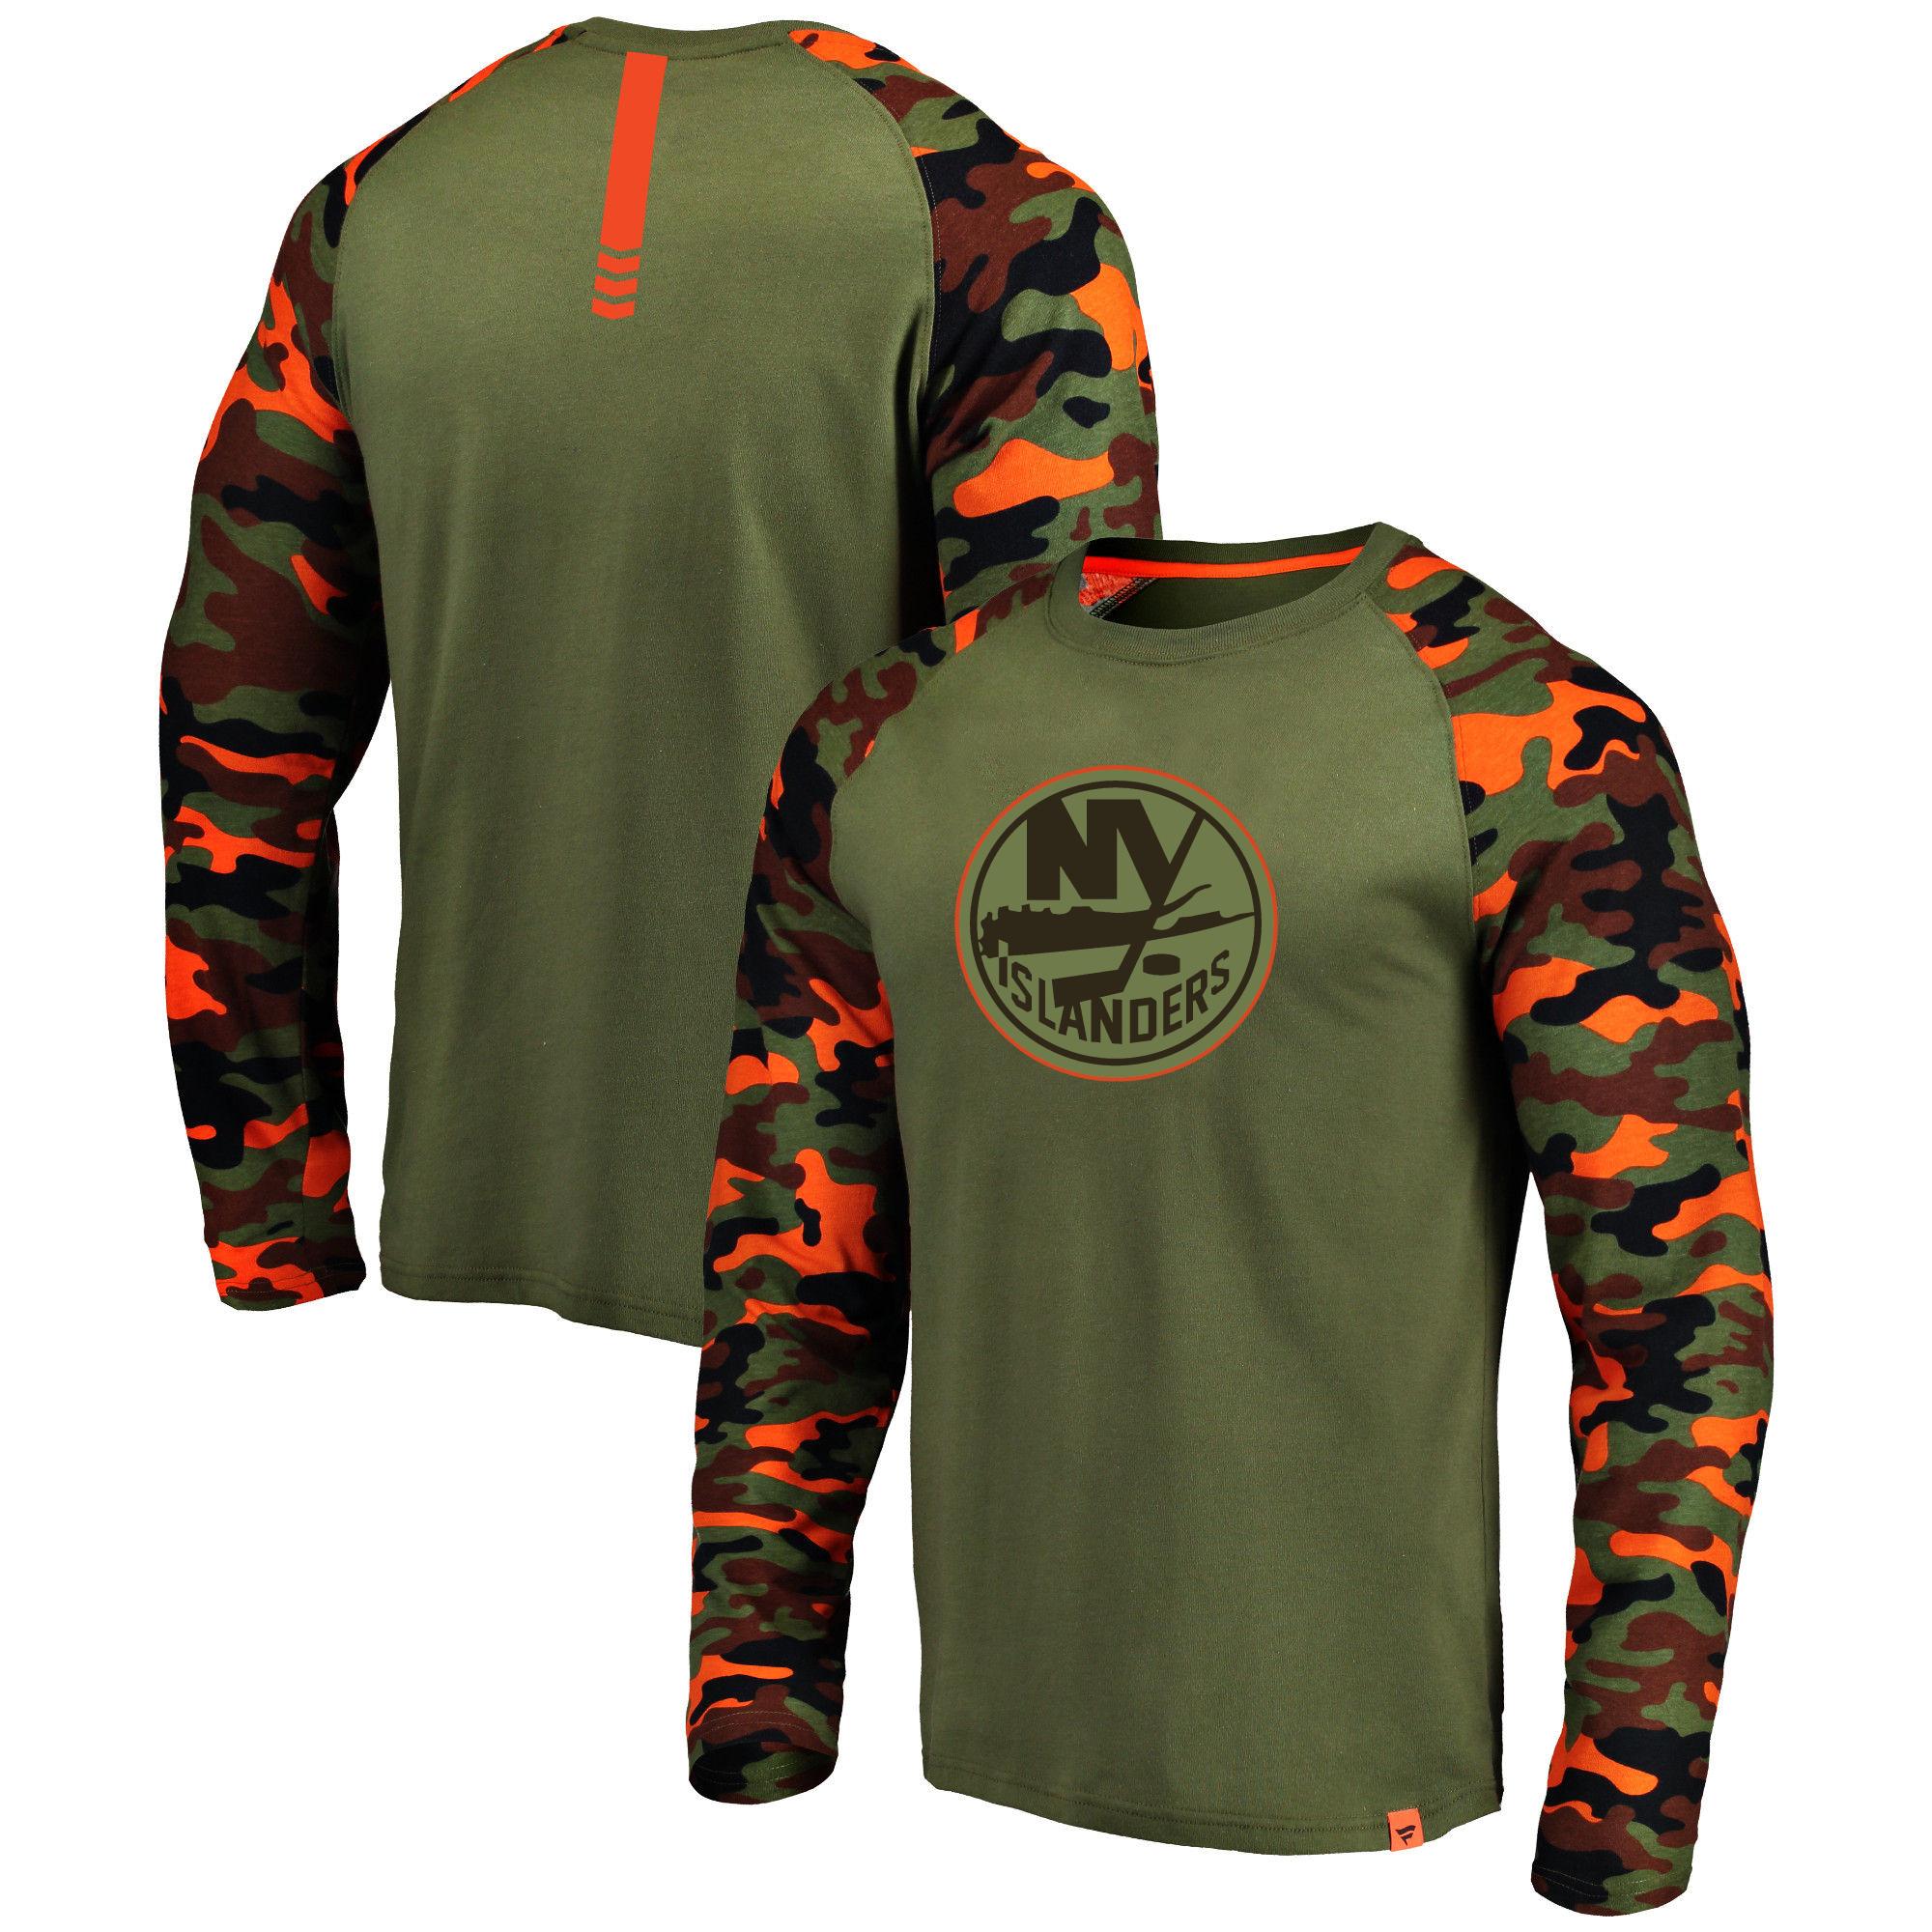 New York Islanders Fanatics Branded Olive/Camo Recon Long Sleeve Raglan T-Shirt